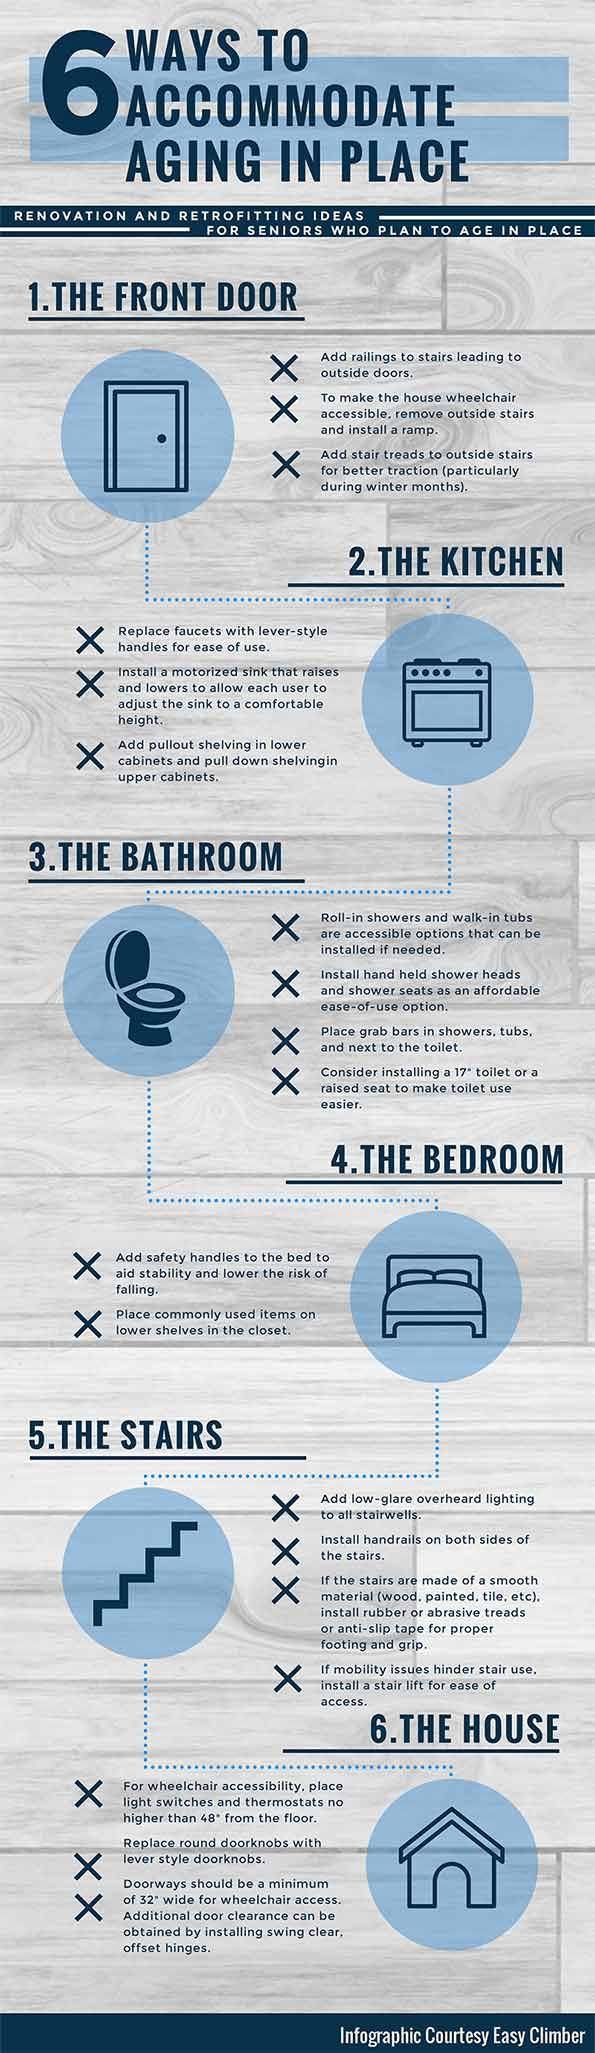 best 25 handicap accessible home ideas on pinterest handicap bathroom ada bathroom and grab. Black Bedroom Furniture Sets. Home Design Ideas